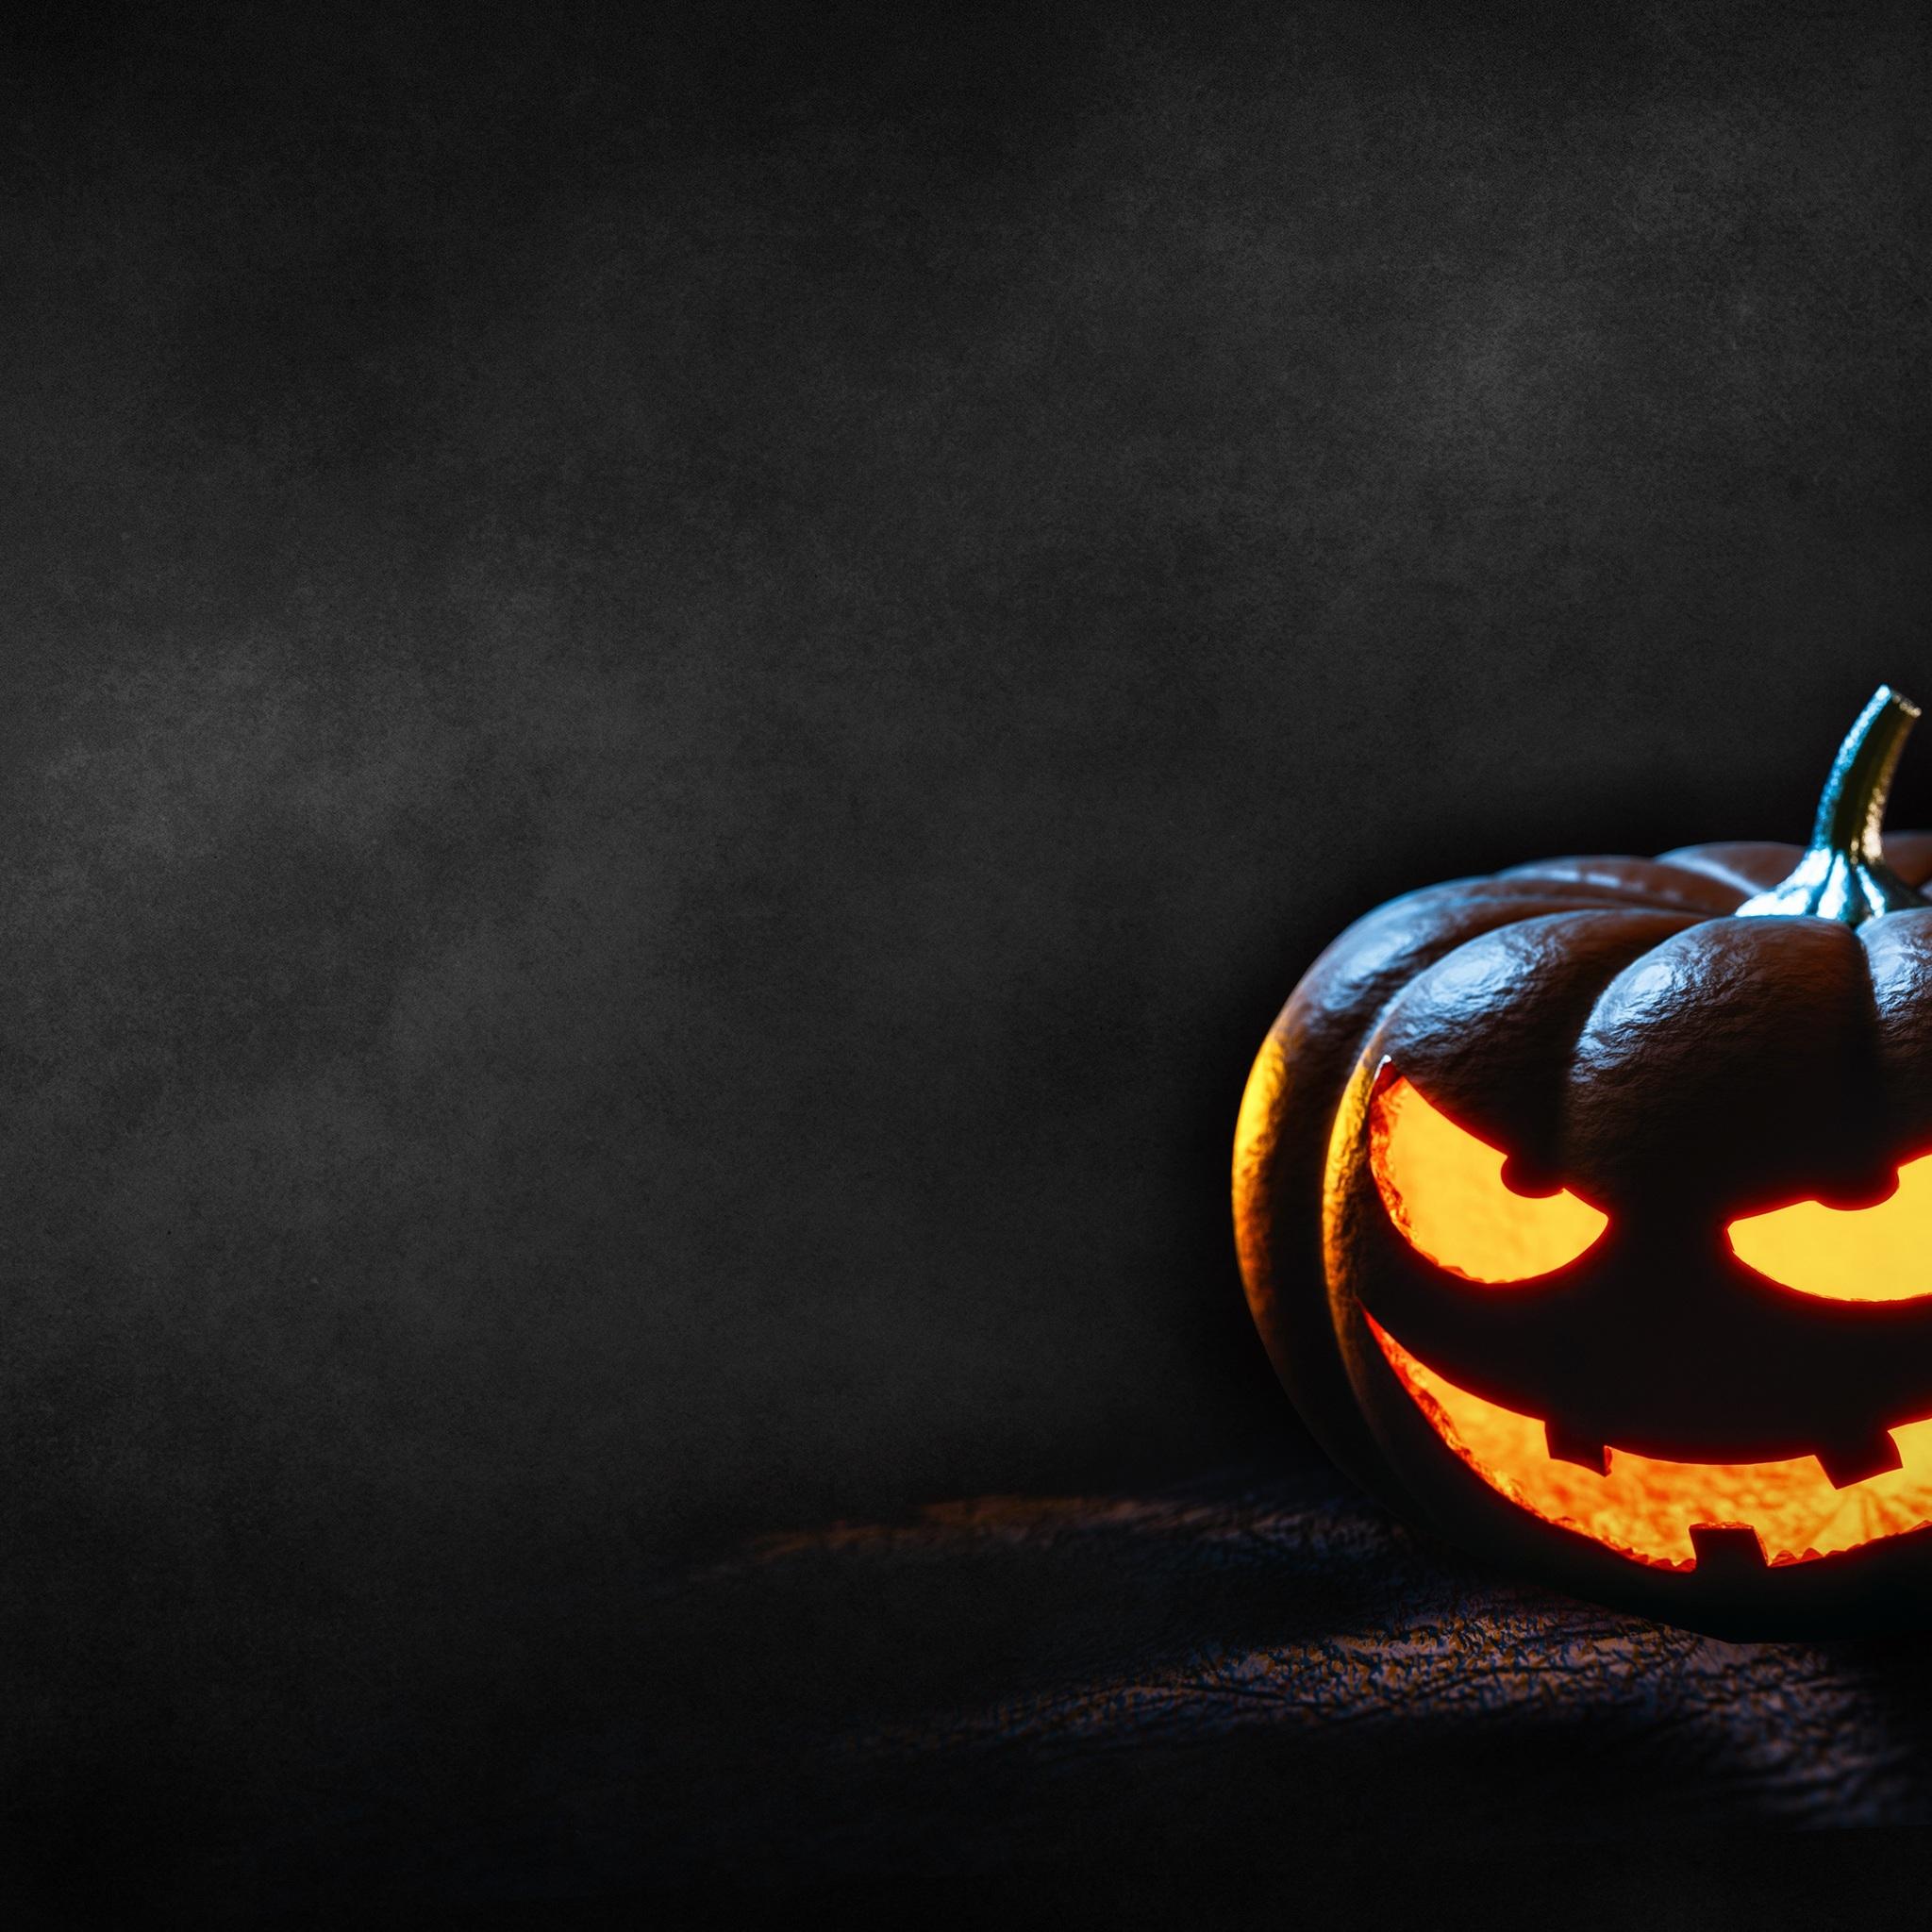 happy-halloween-pumpkin-img.jpg